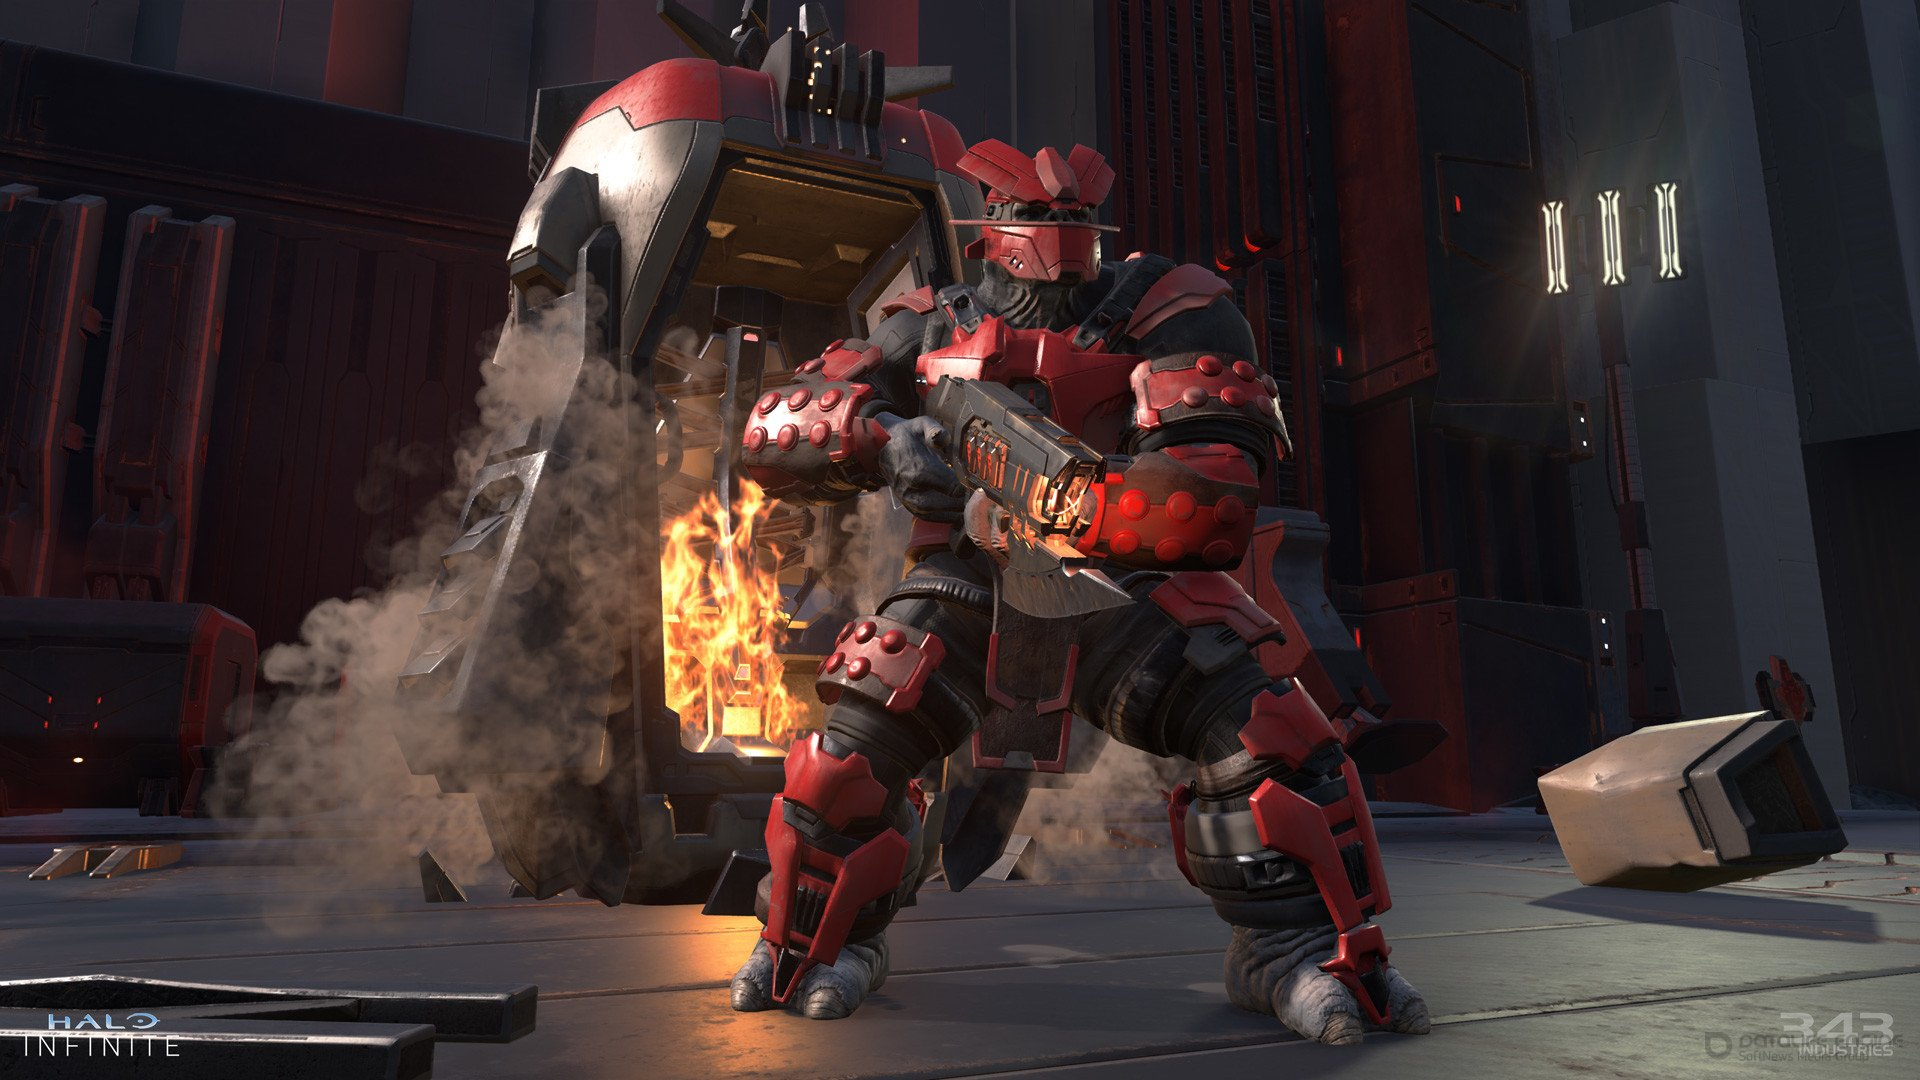 Screenshot for the game Halo Infinite (2020)